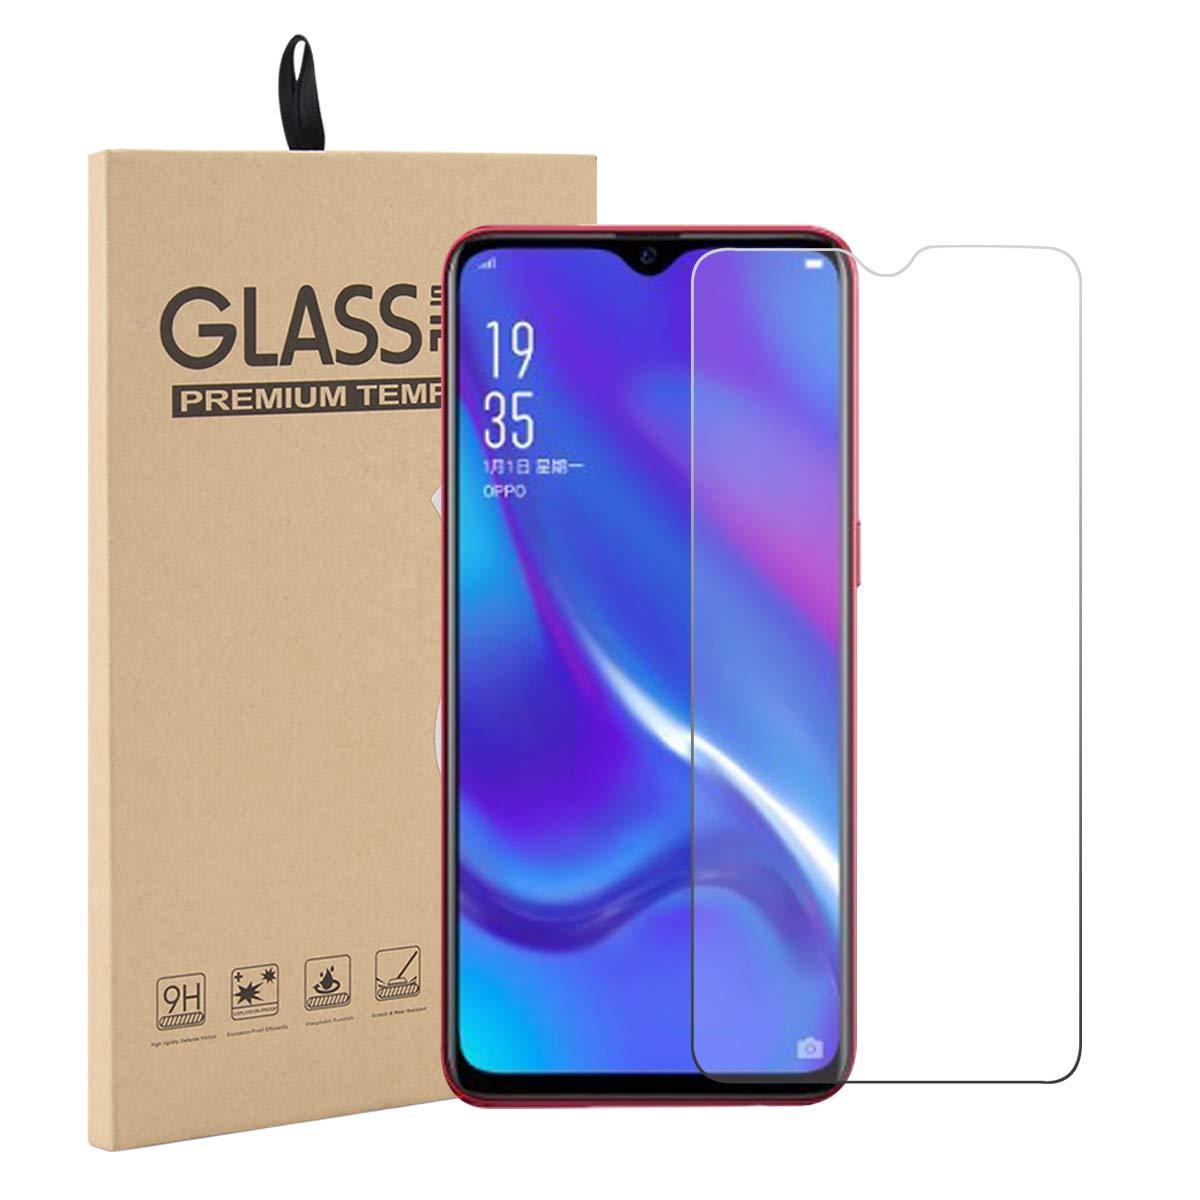 Купить 9 H 2.5D Закаленное стекло смартфон для OPPO K3 Защитная пленка для экрана Защитная крышка для телефона для OPPO A9 A1K A9X A5S на Алиэкспресс